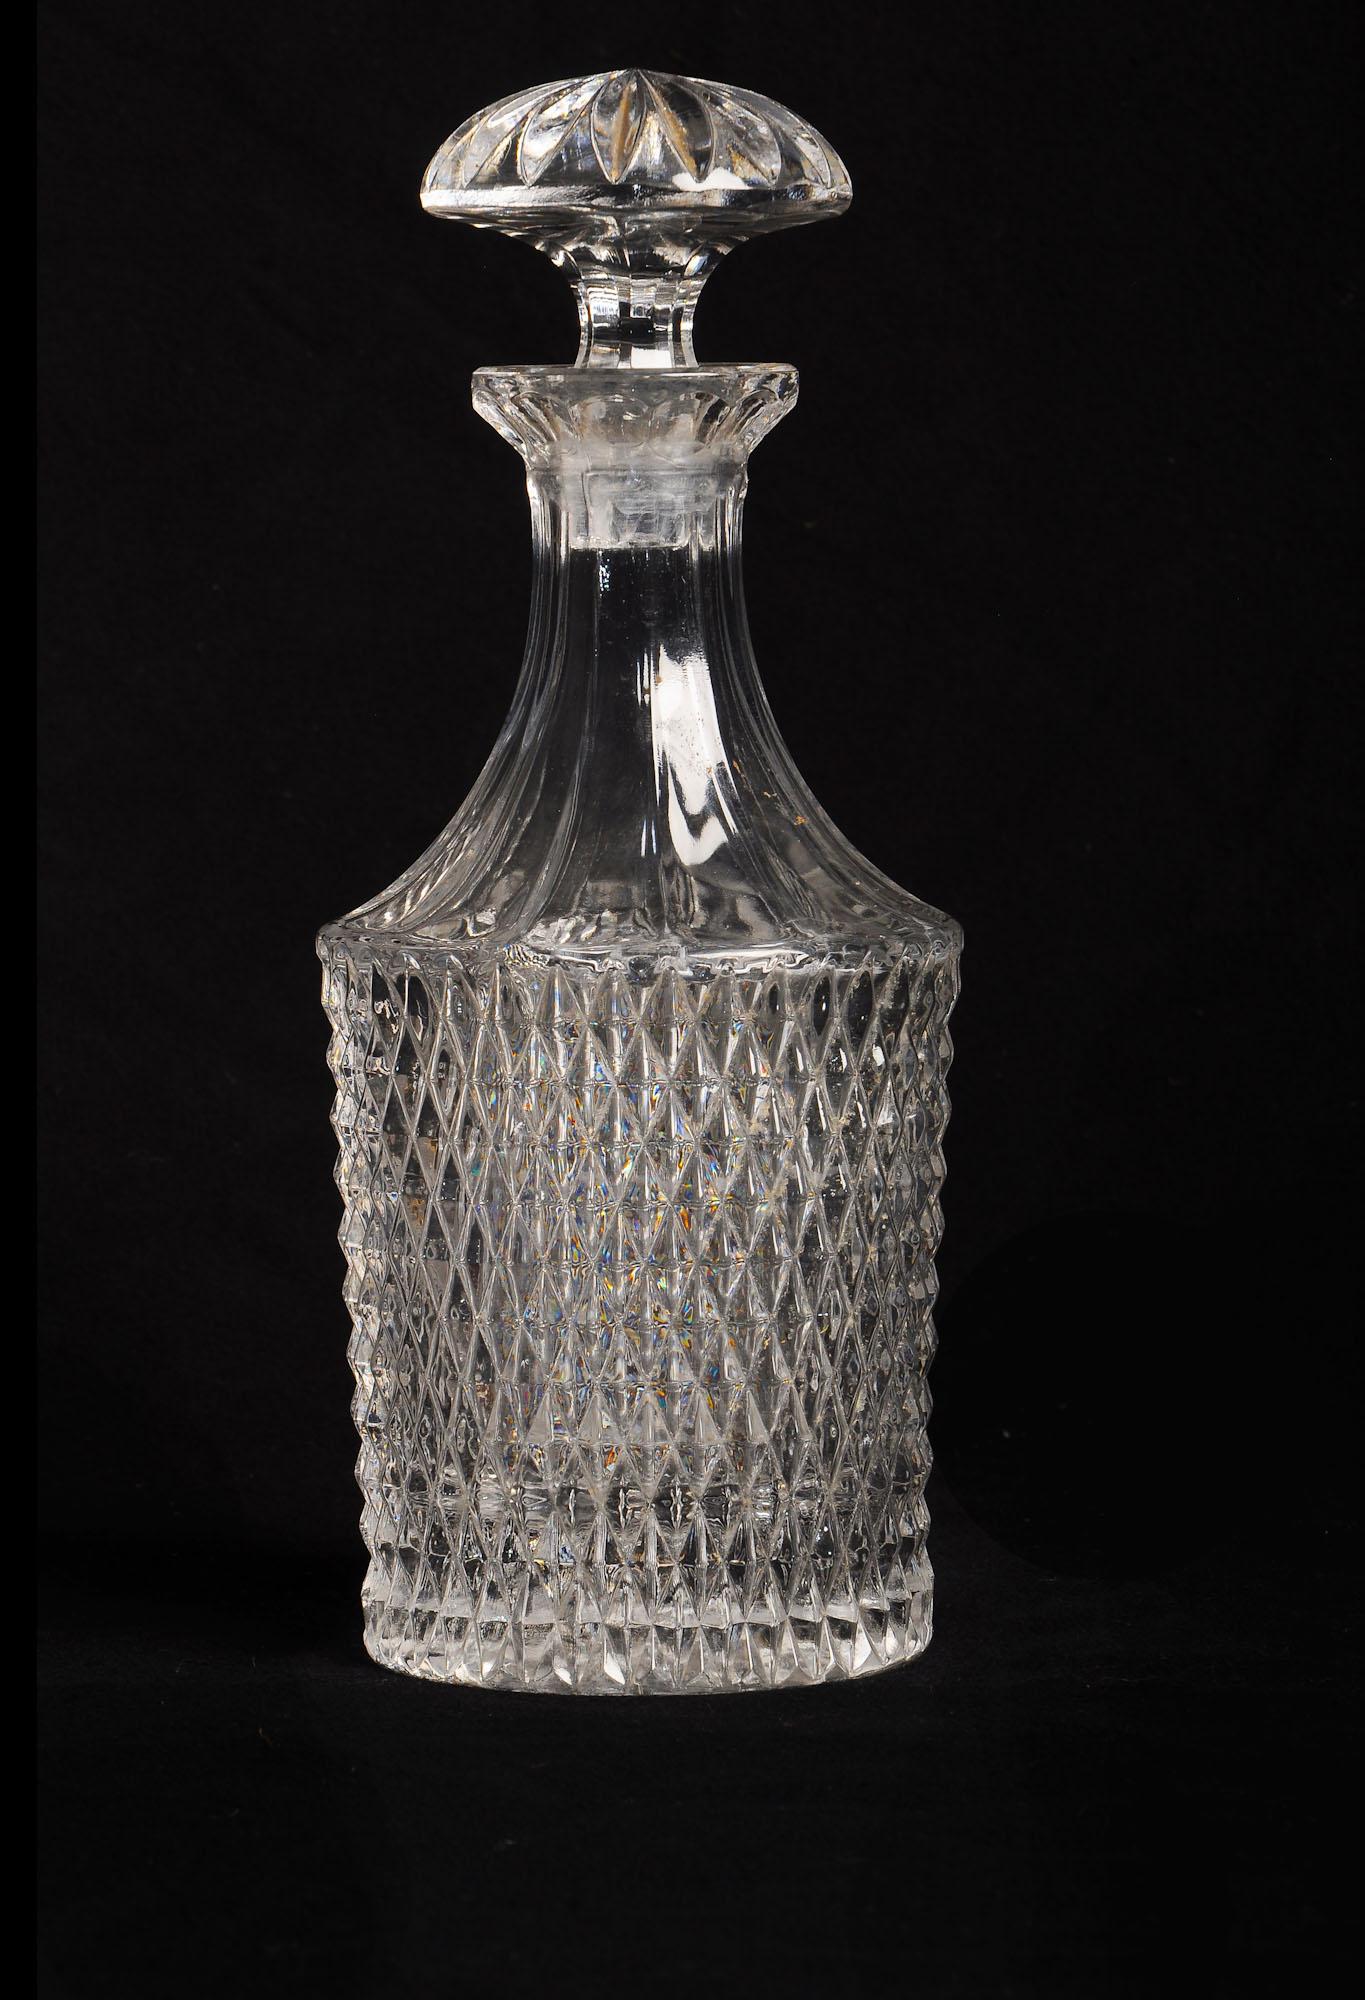 Cut Glass Decanter - SKU 1552